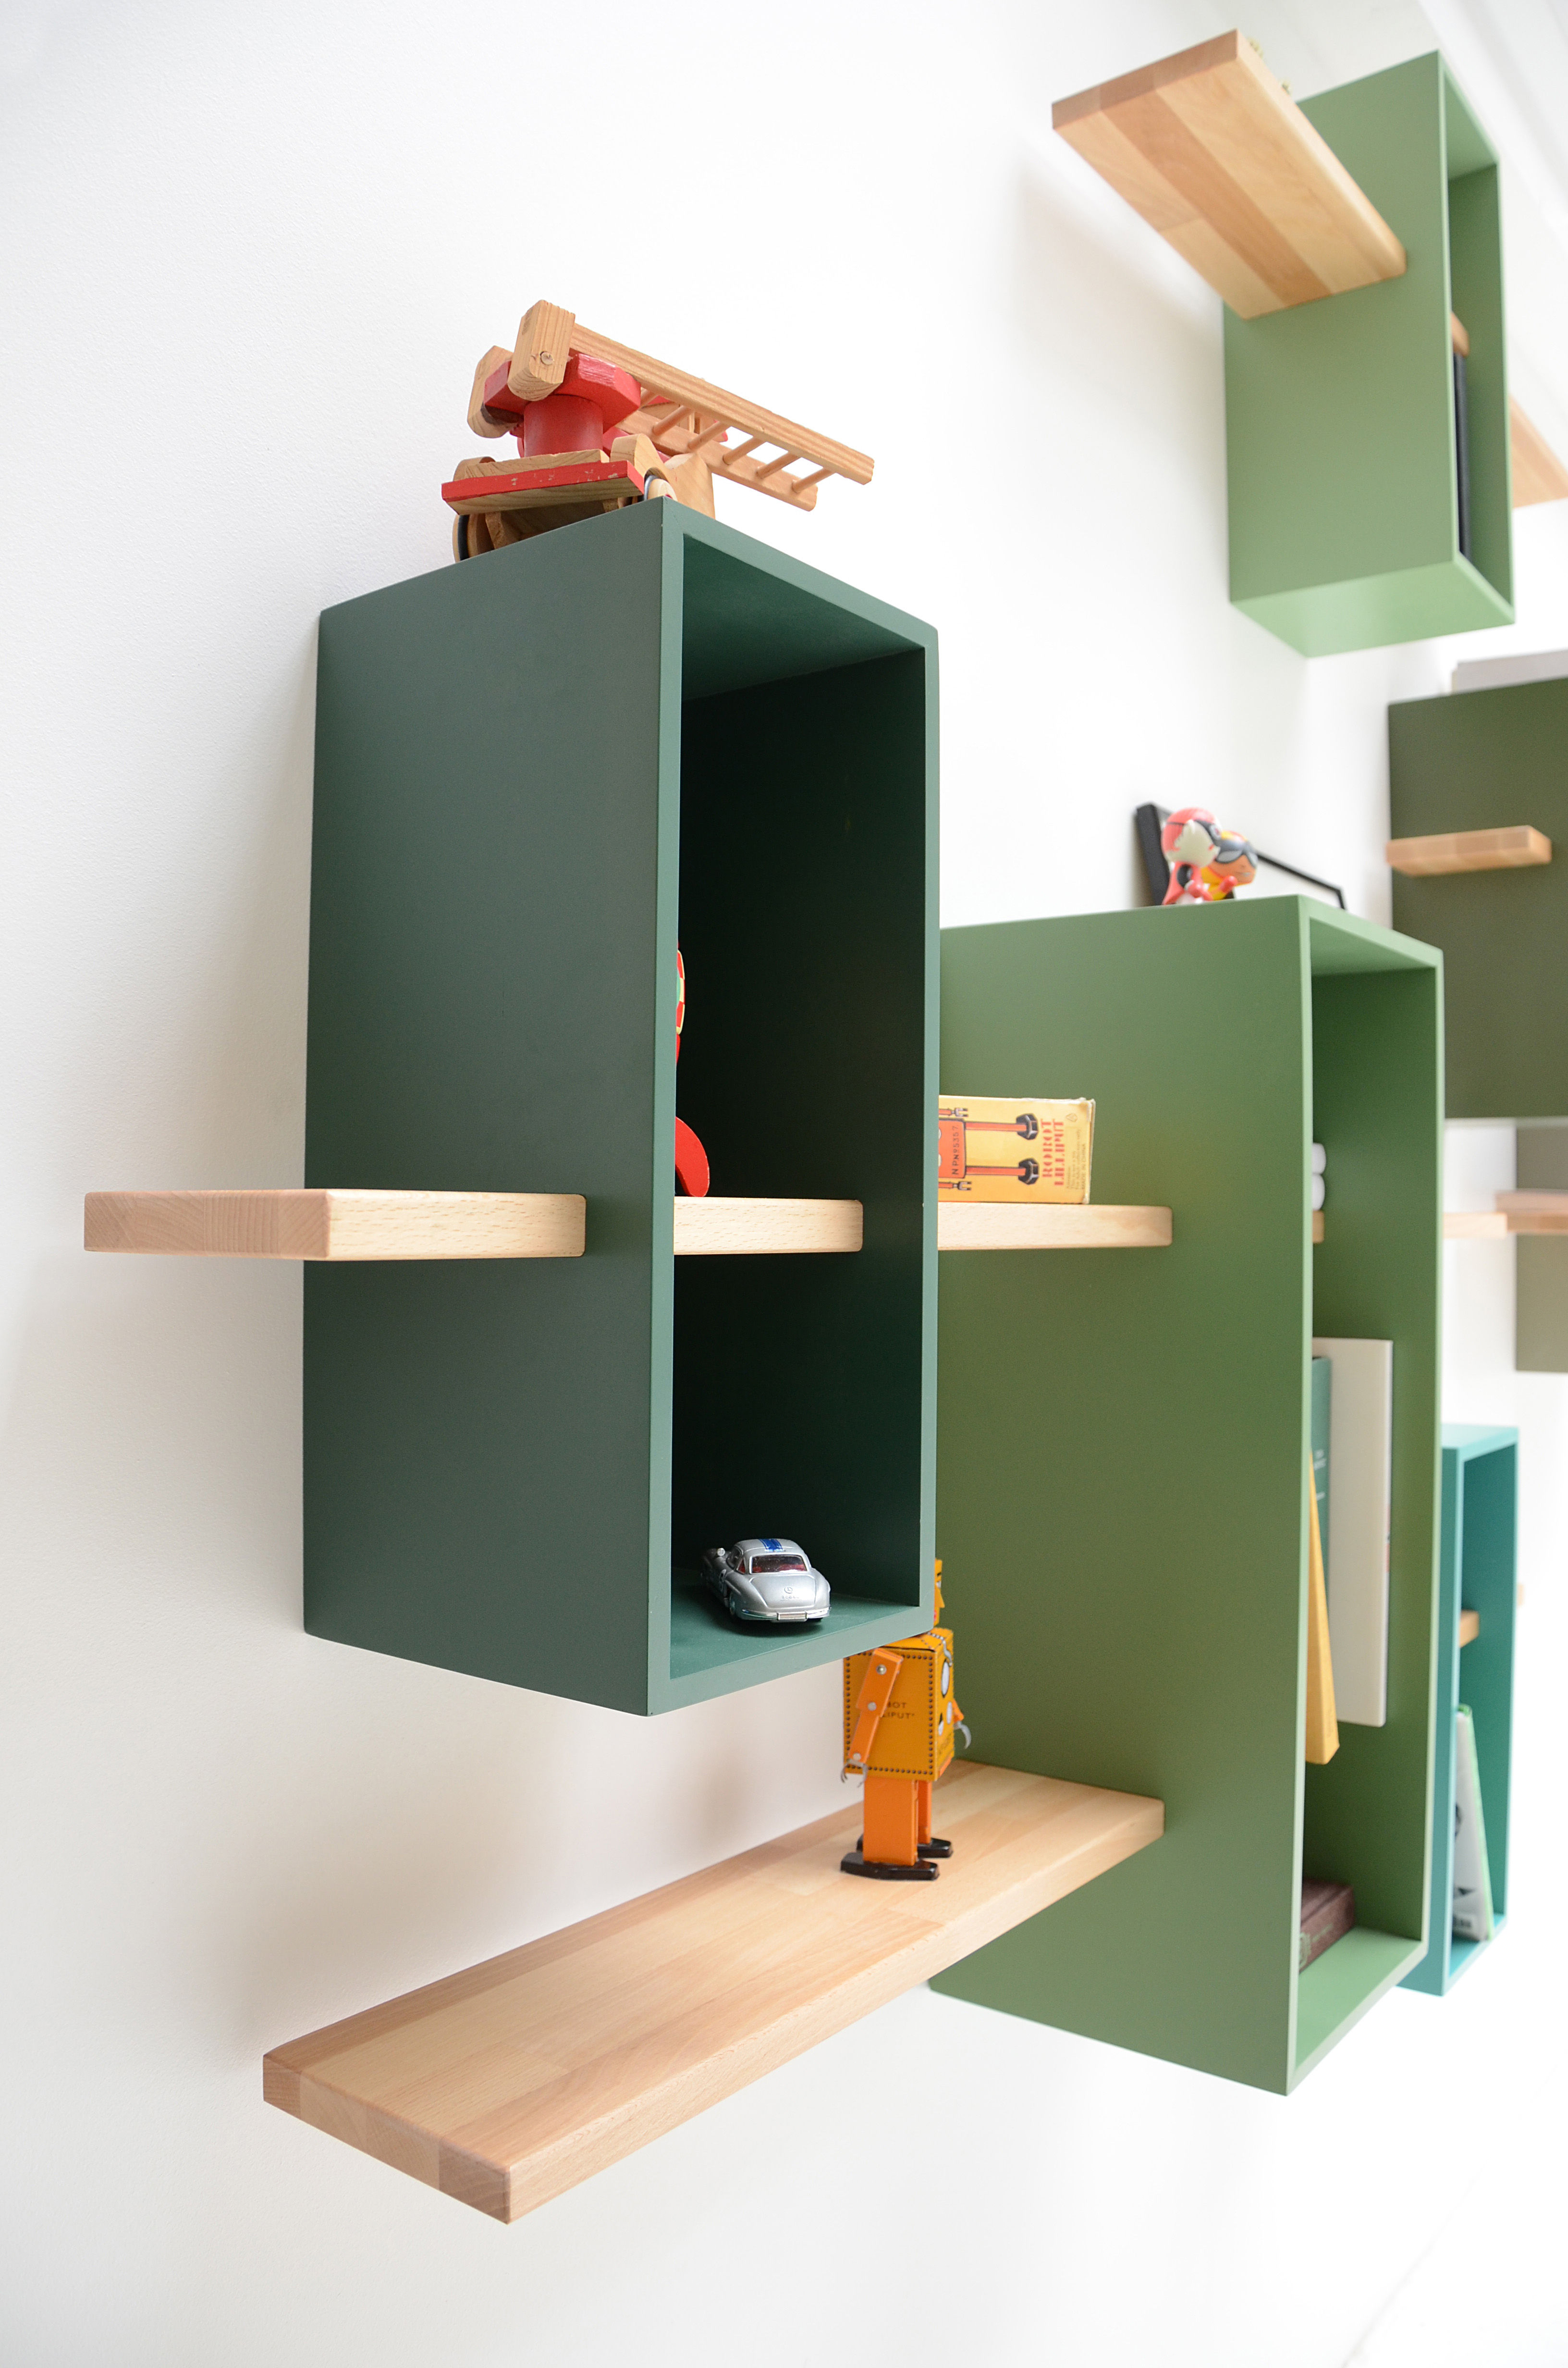 etag re max simple 1 caisson 1 tag re vert p le. Black Bedroom Furniture Sets. Home Design Ideas